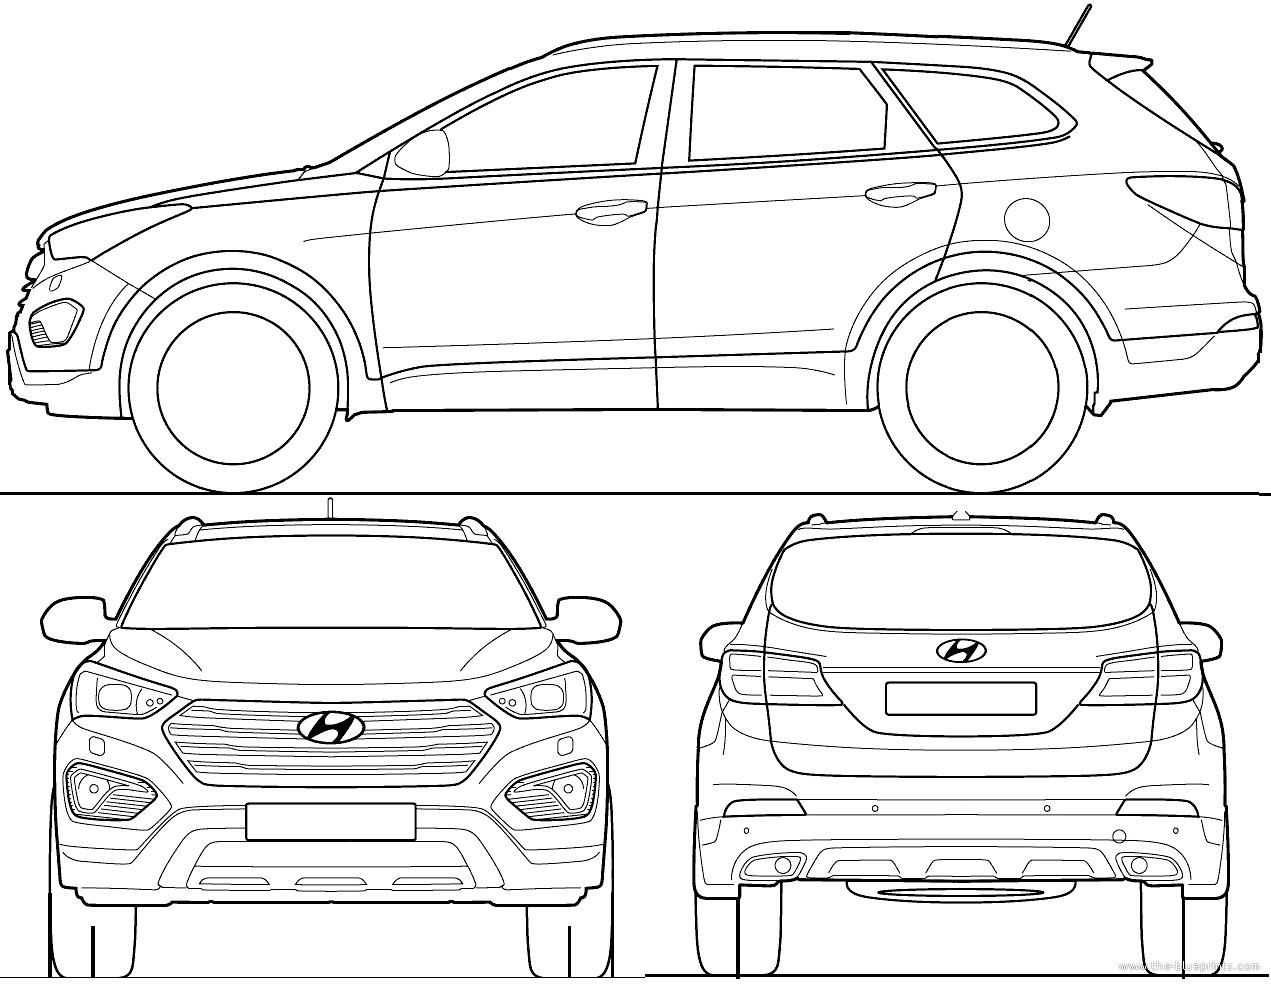 Blueprints Gt Cars Gt Hyundai Gt Hyundai Grand Santa Fe